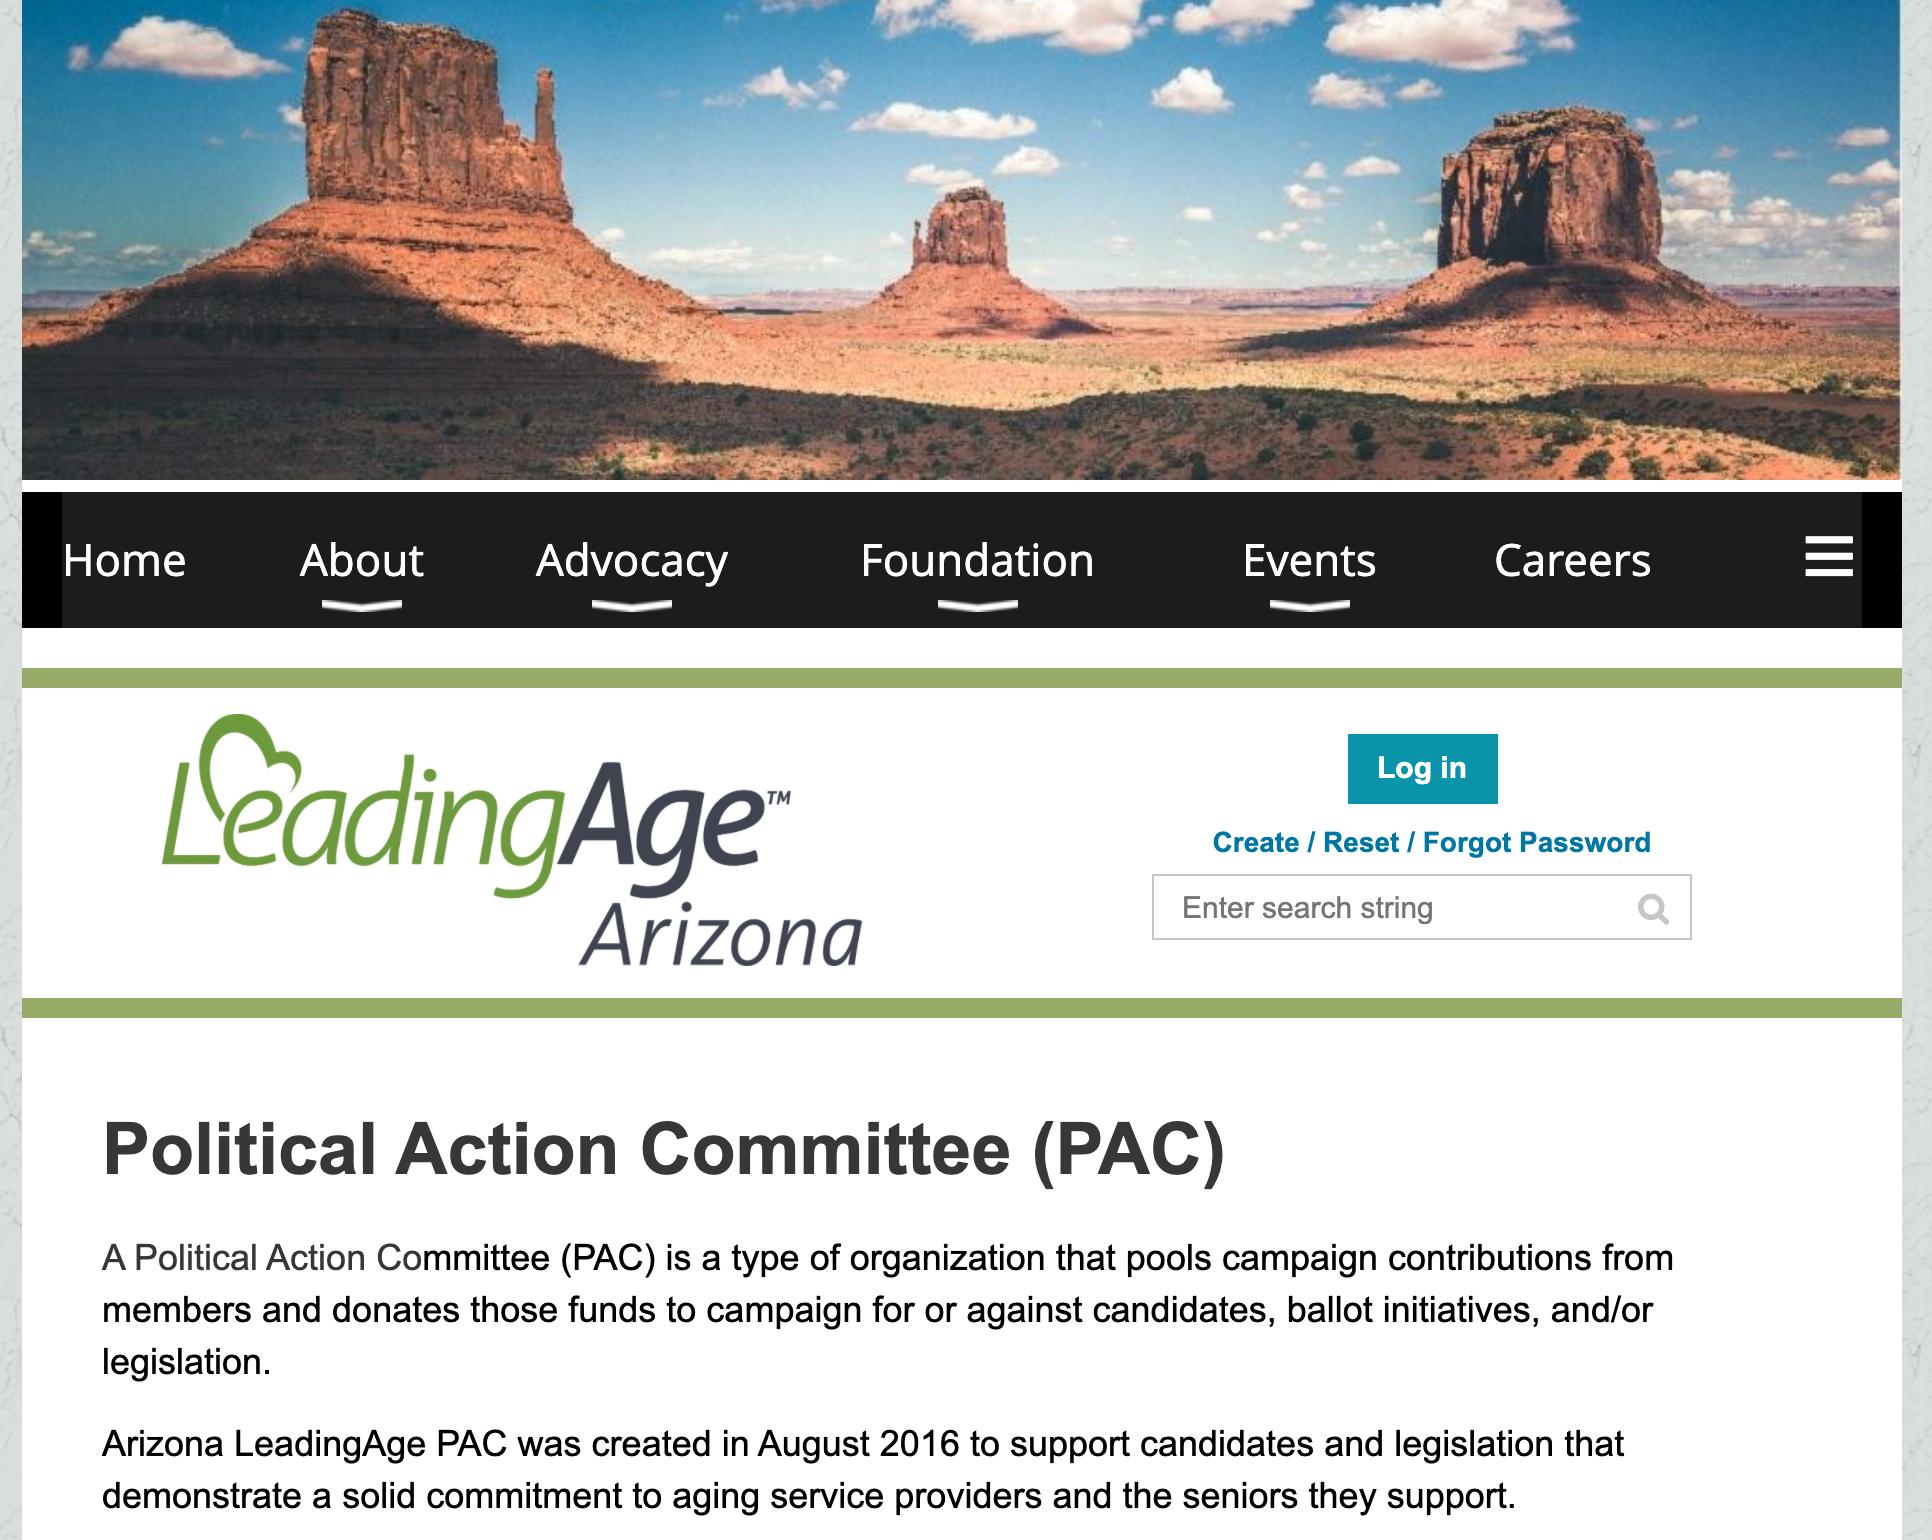 Arizona LeadingAge PAC